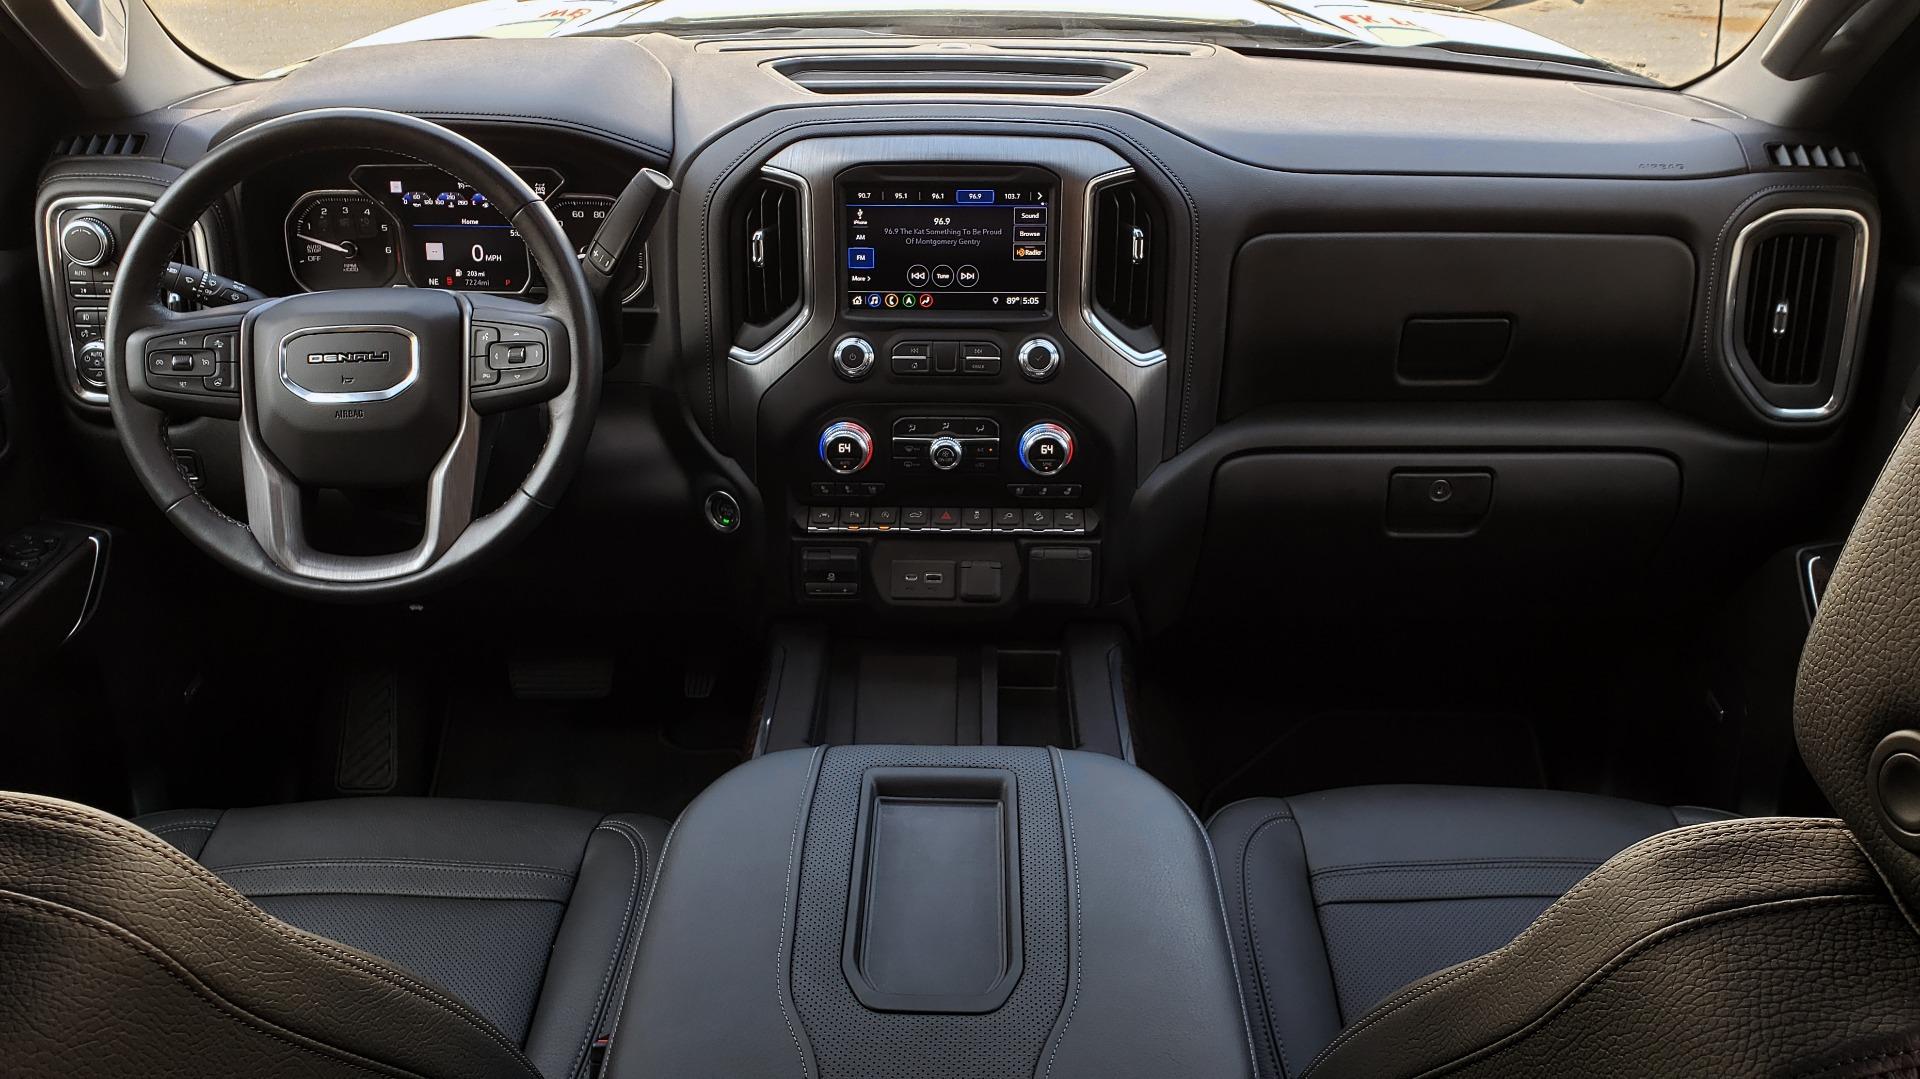 Used 2019 GMC SIERRA 1500 DENALI ULTIMATE 4WD / NAV / TECH PKG / DRVR ALRT for sale Sold at Formula Imports in Charlotte NC 28227 84